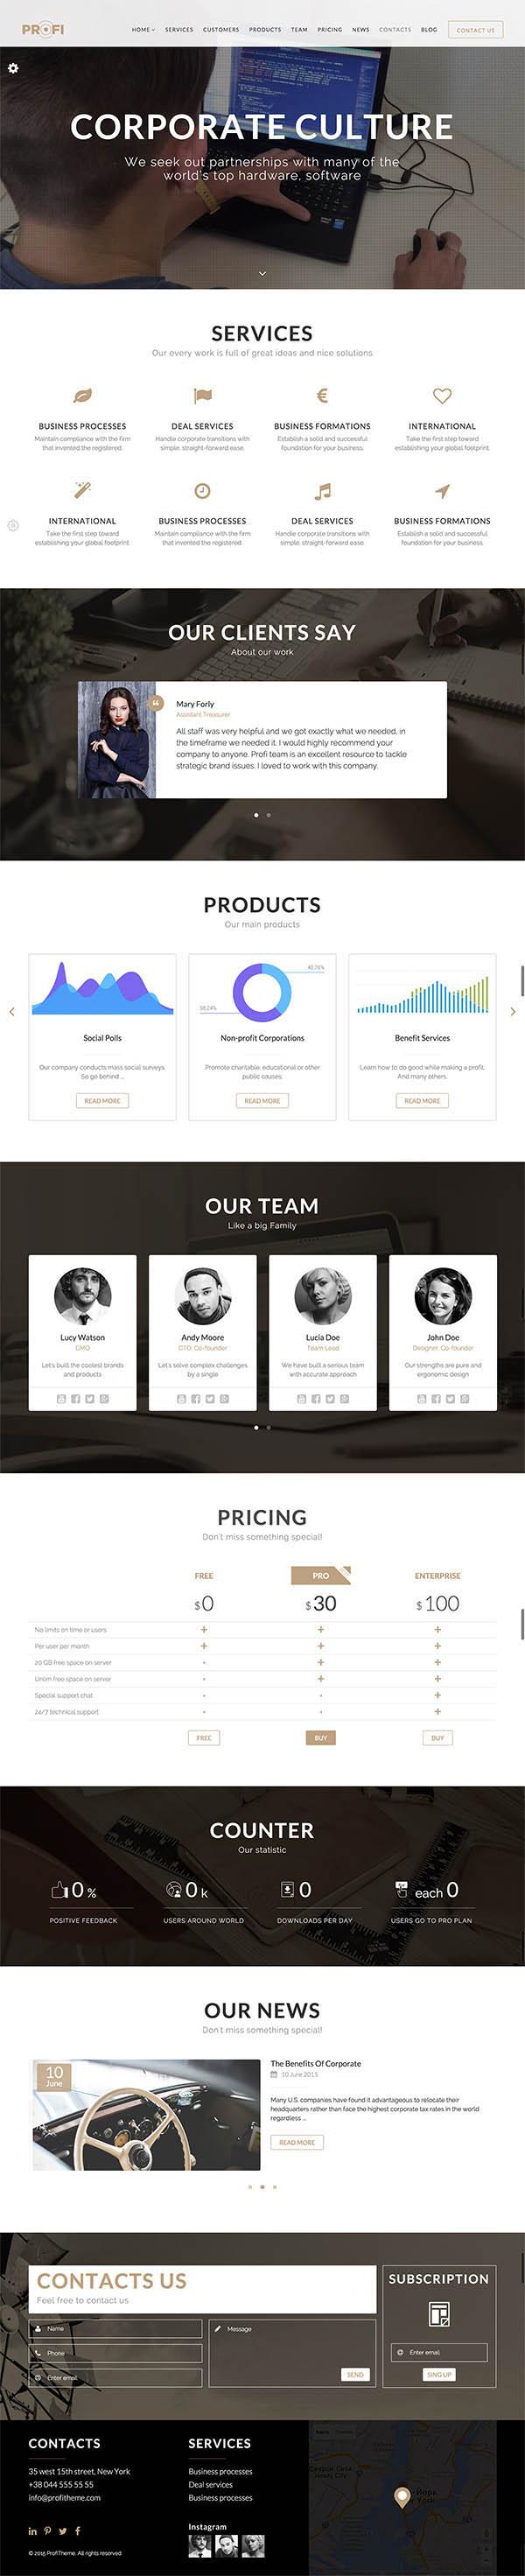 Profi : Multipurpose Corporate WordPress Theme